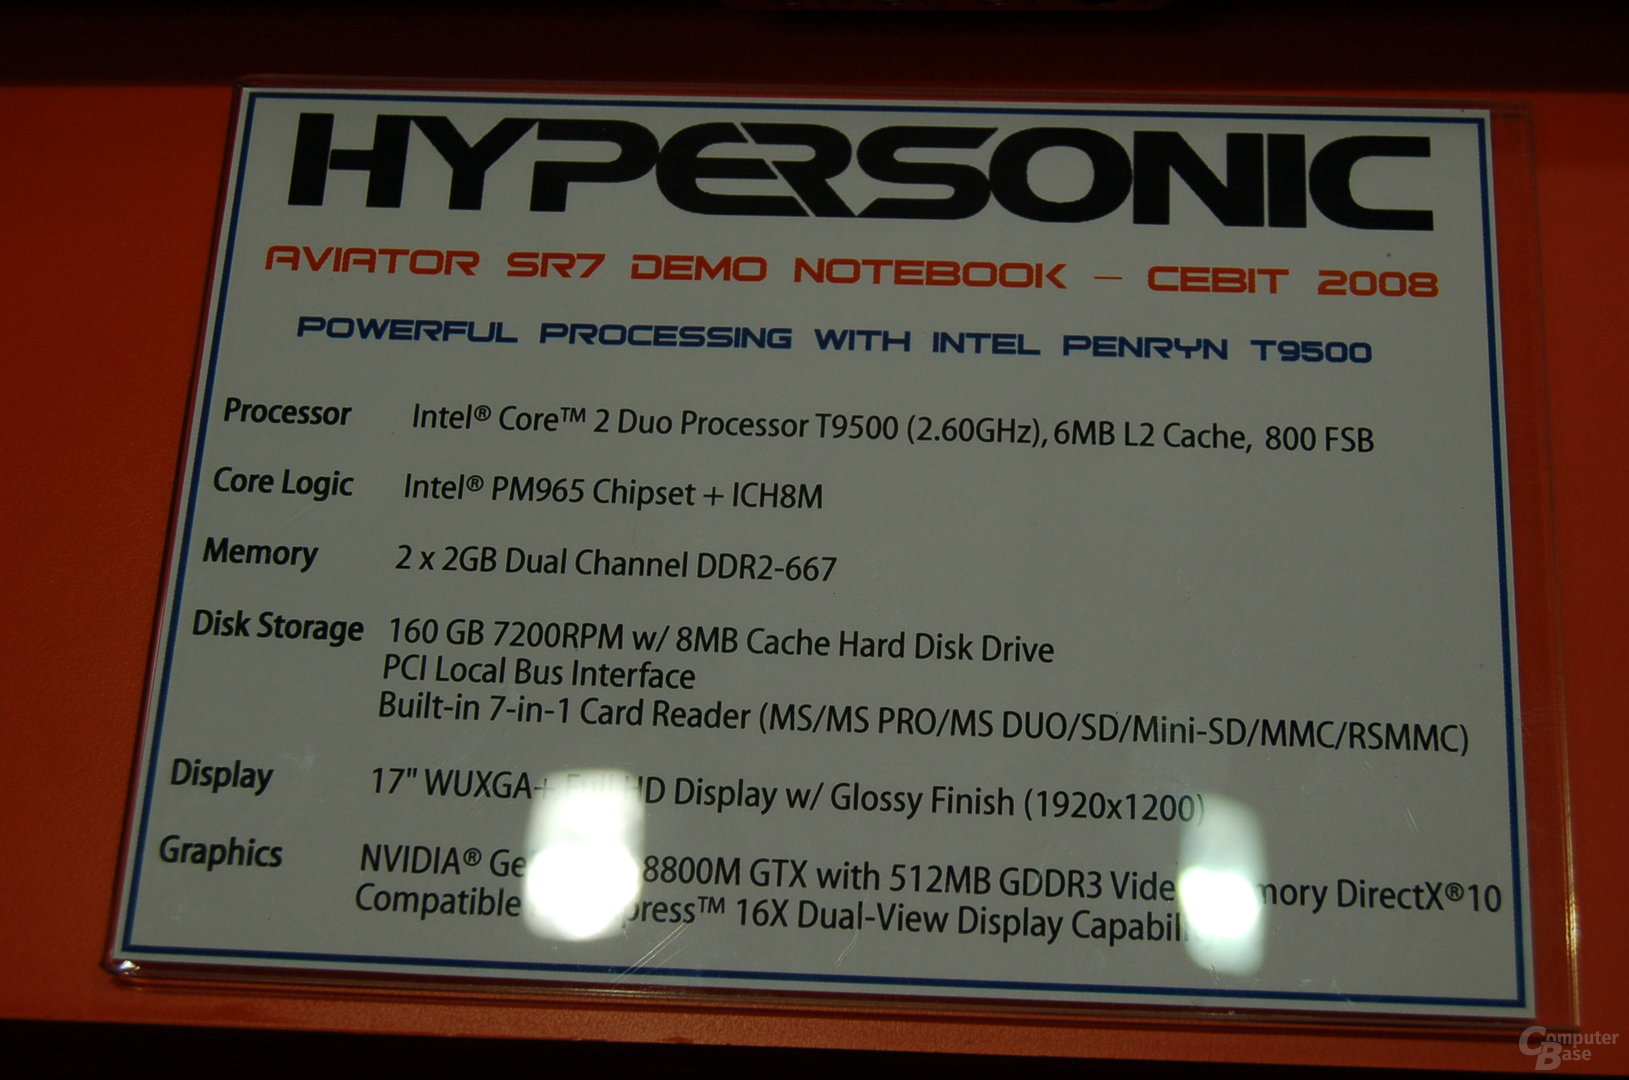 Technische Daten Hypersonic Aviator SR7